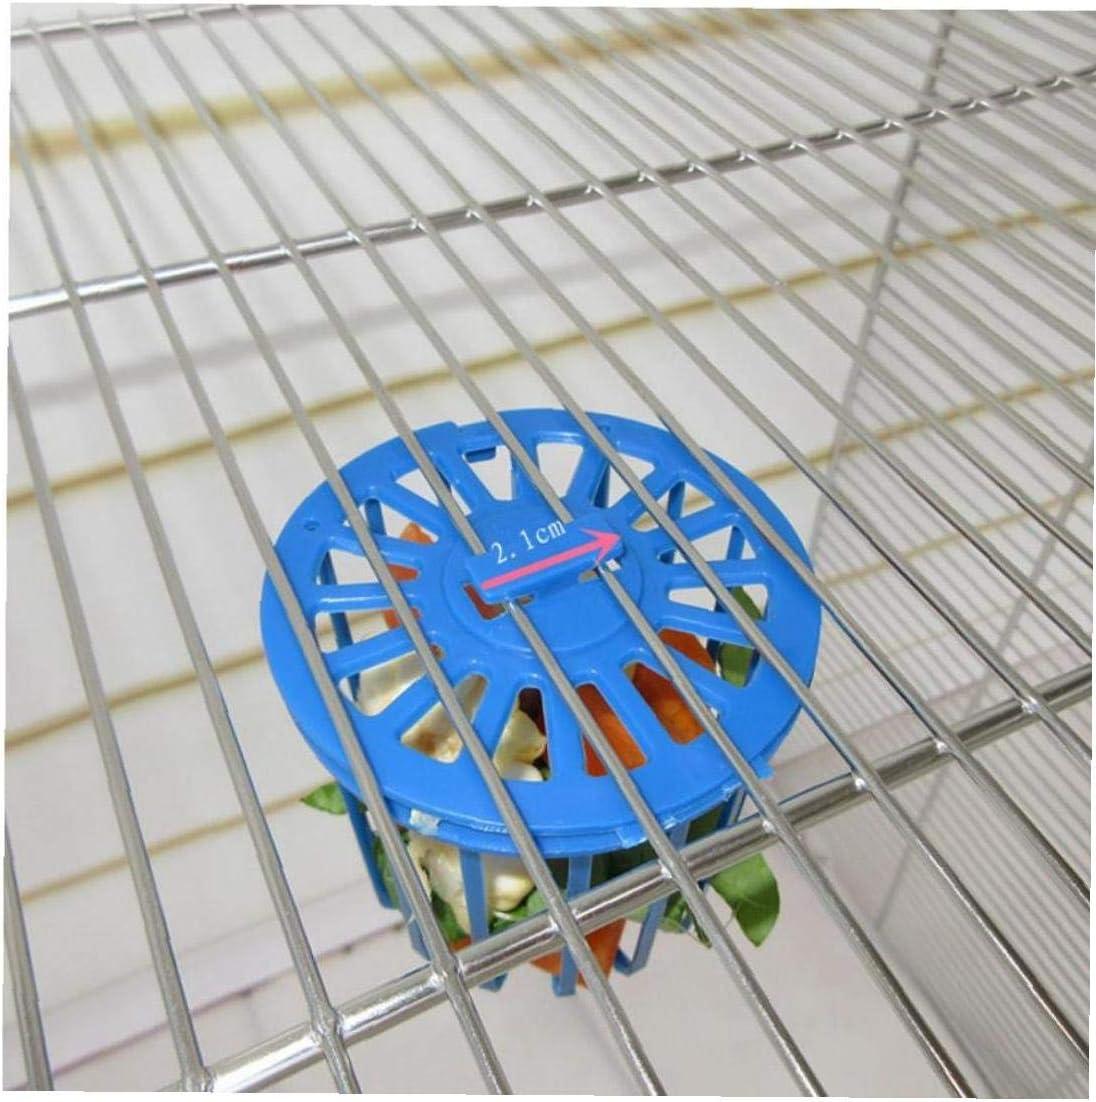 CULER 1 Pc Bird Feeder Cage Fruit Vegetable Holder Hanging Basket Container Toys for Parrot Pet Bird